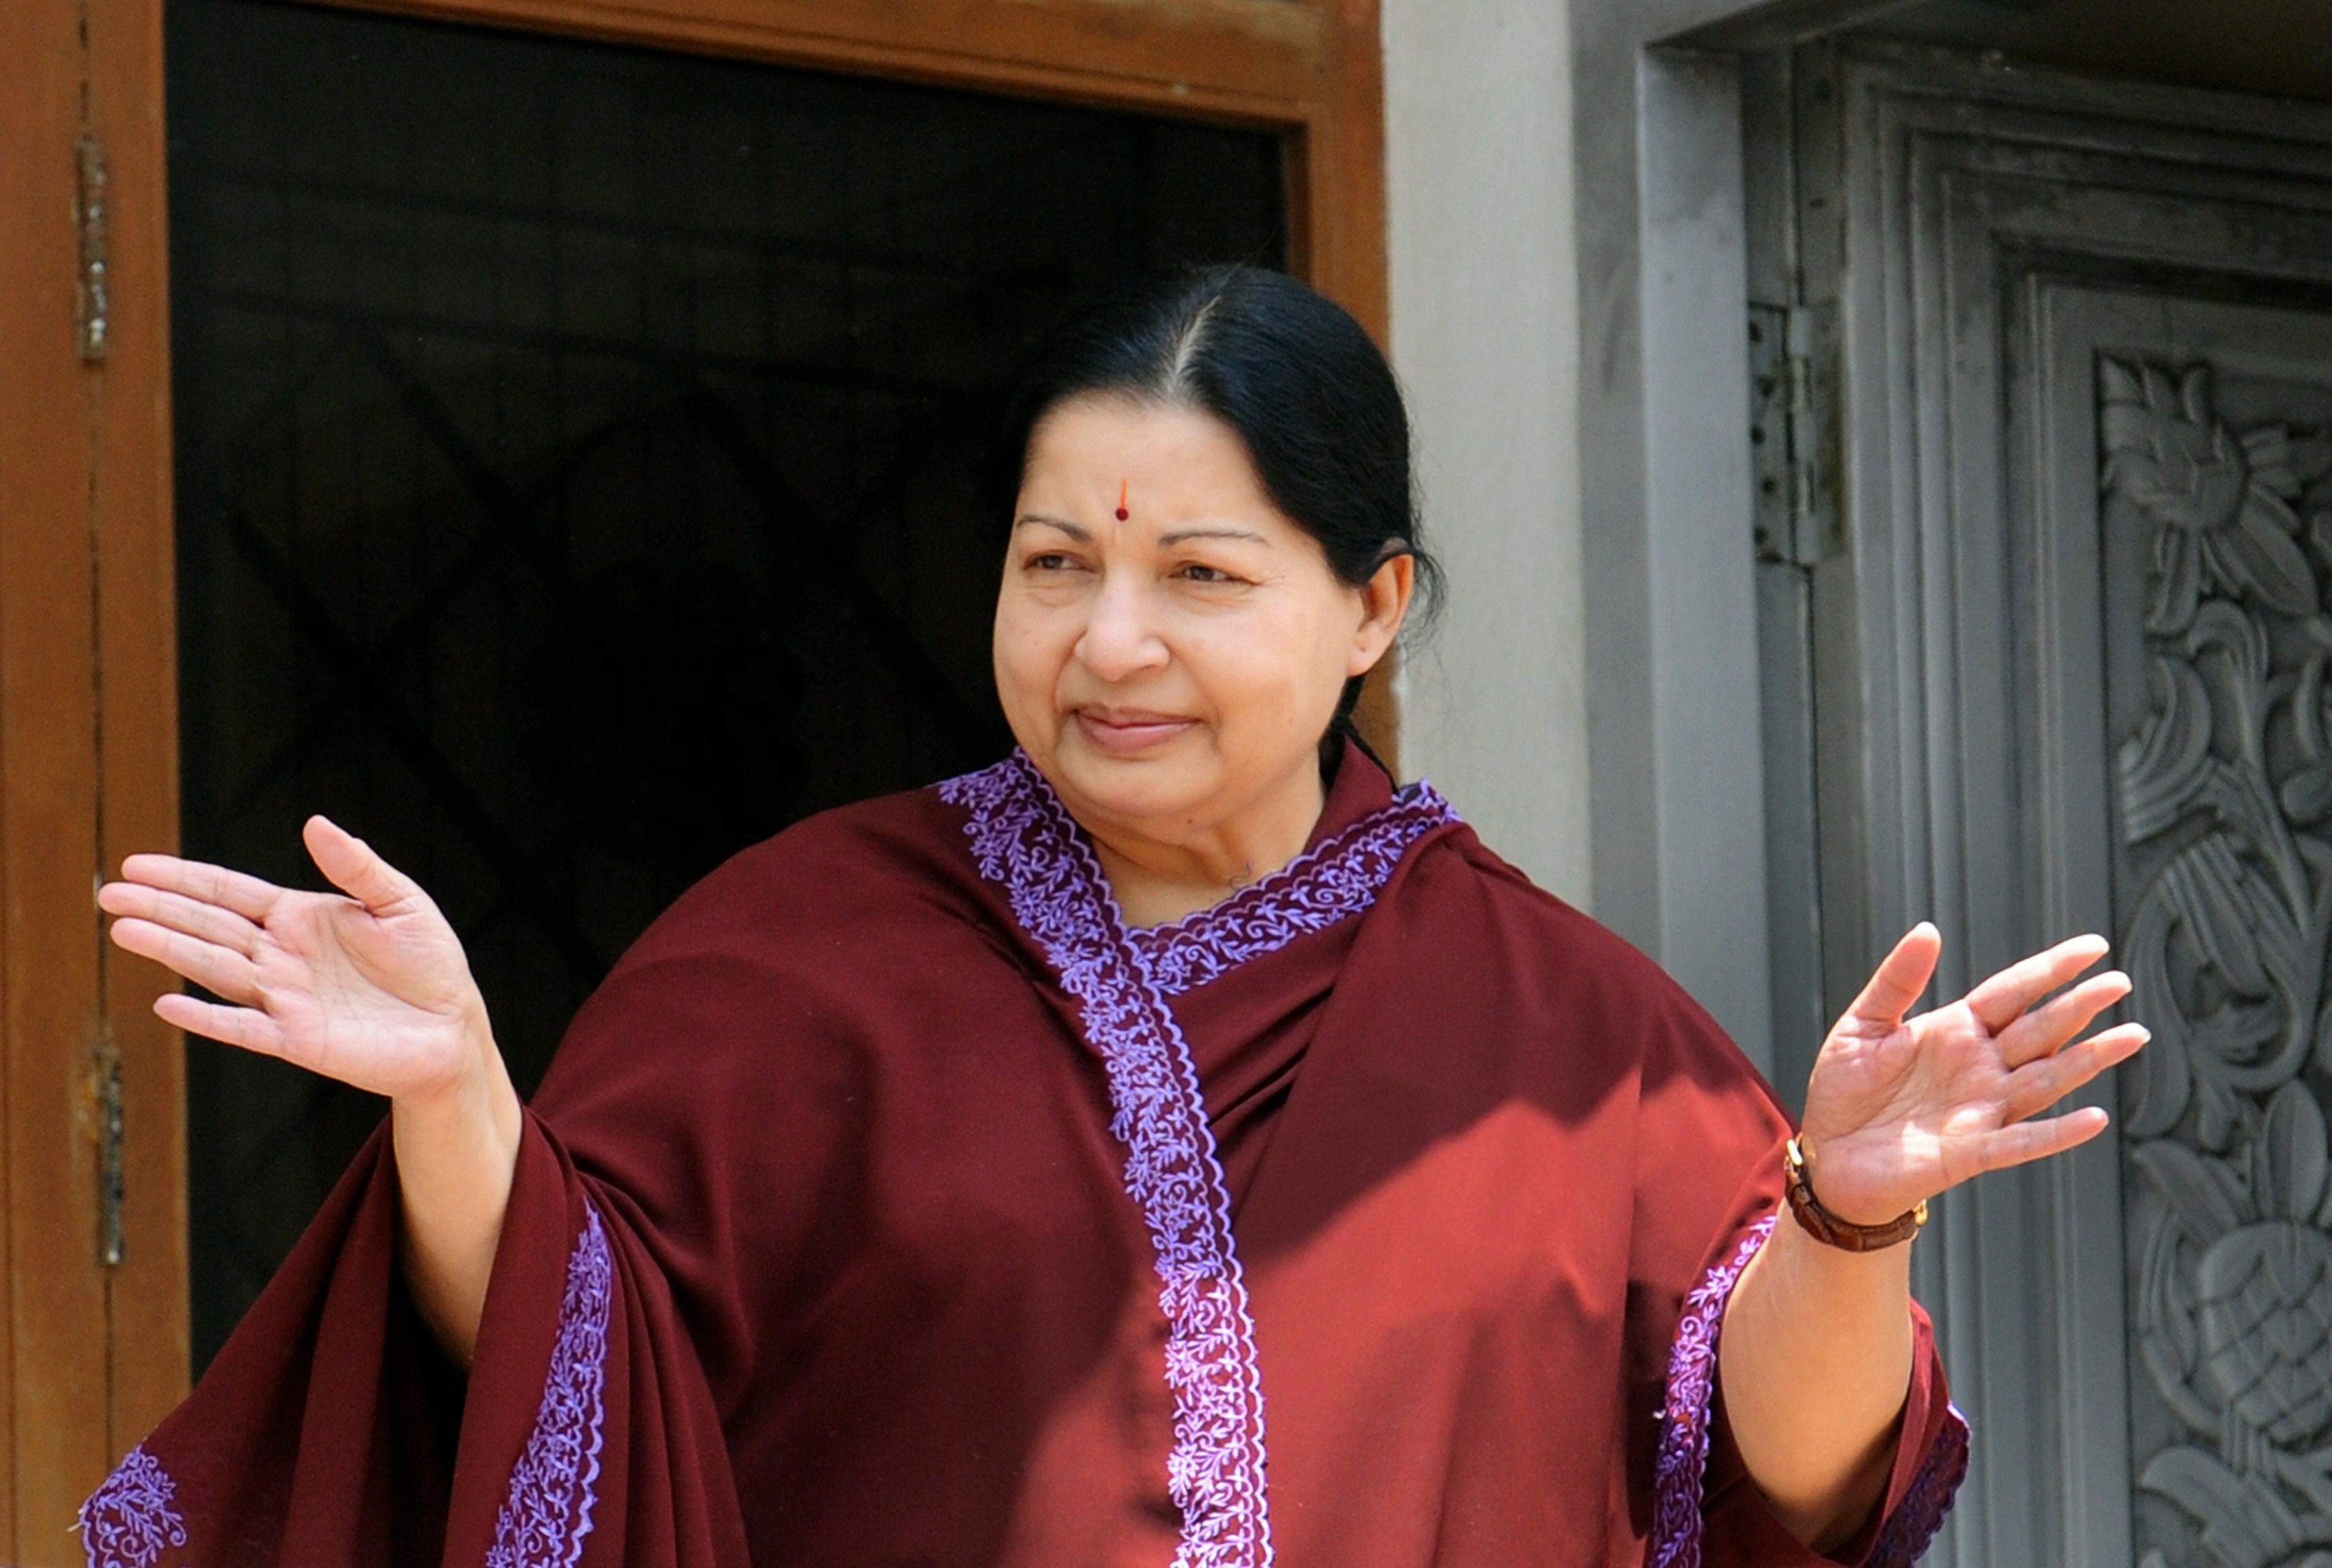 Jayalalithaa has completely recovered: Pratap Reddy